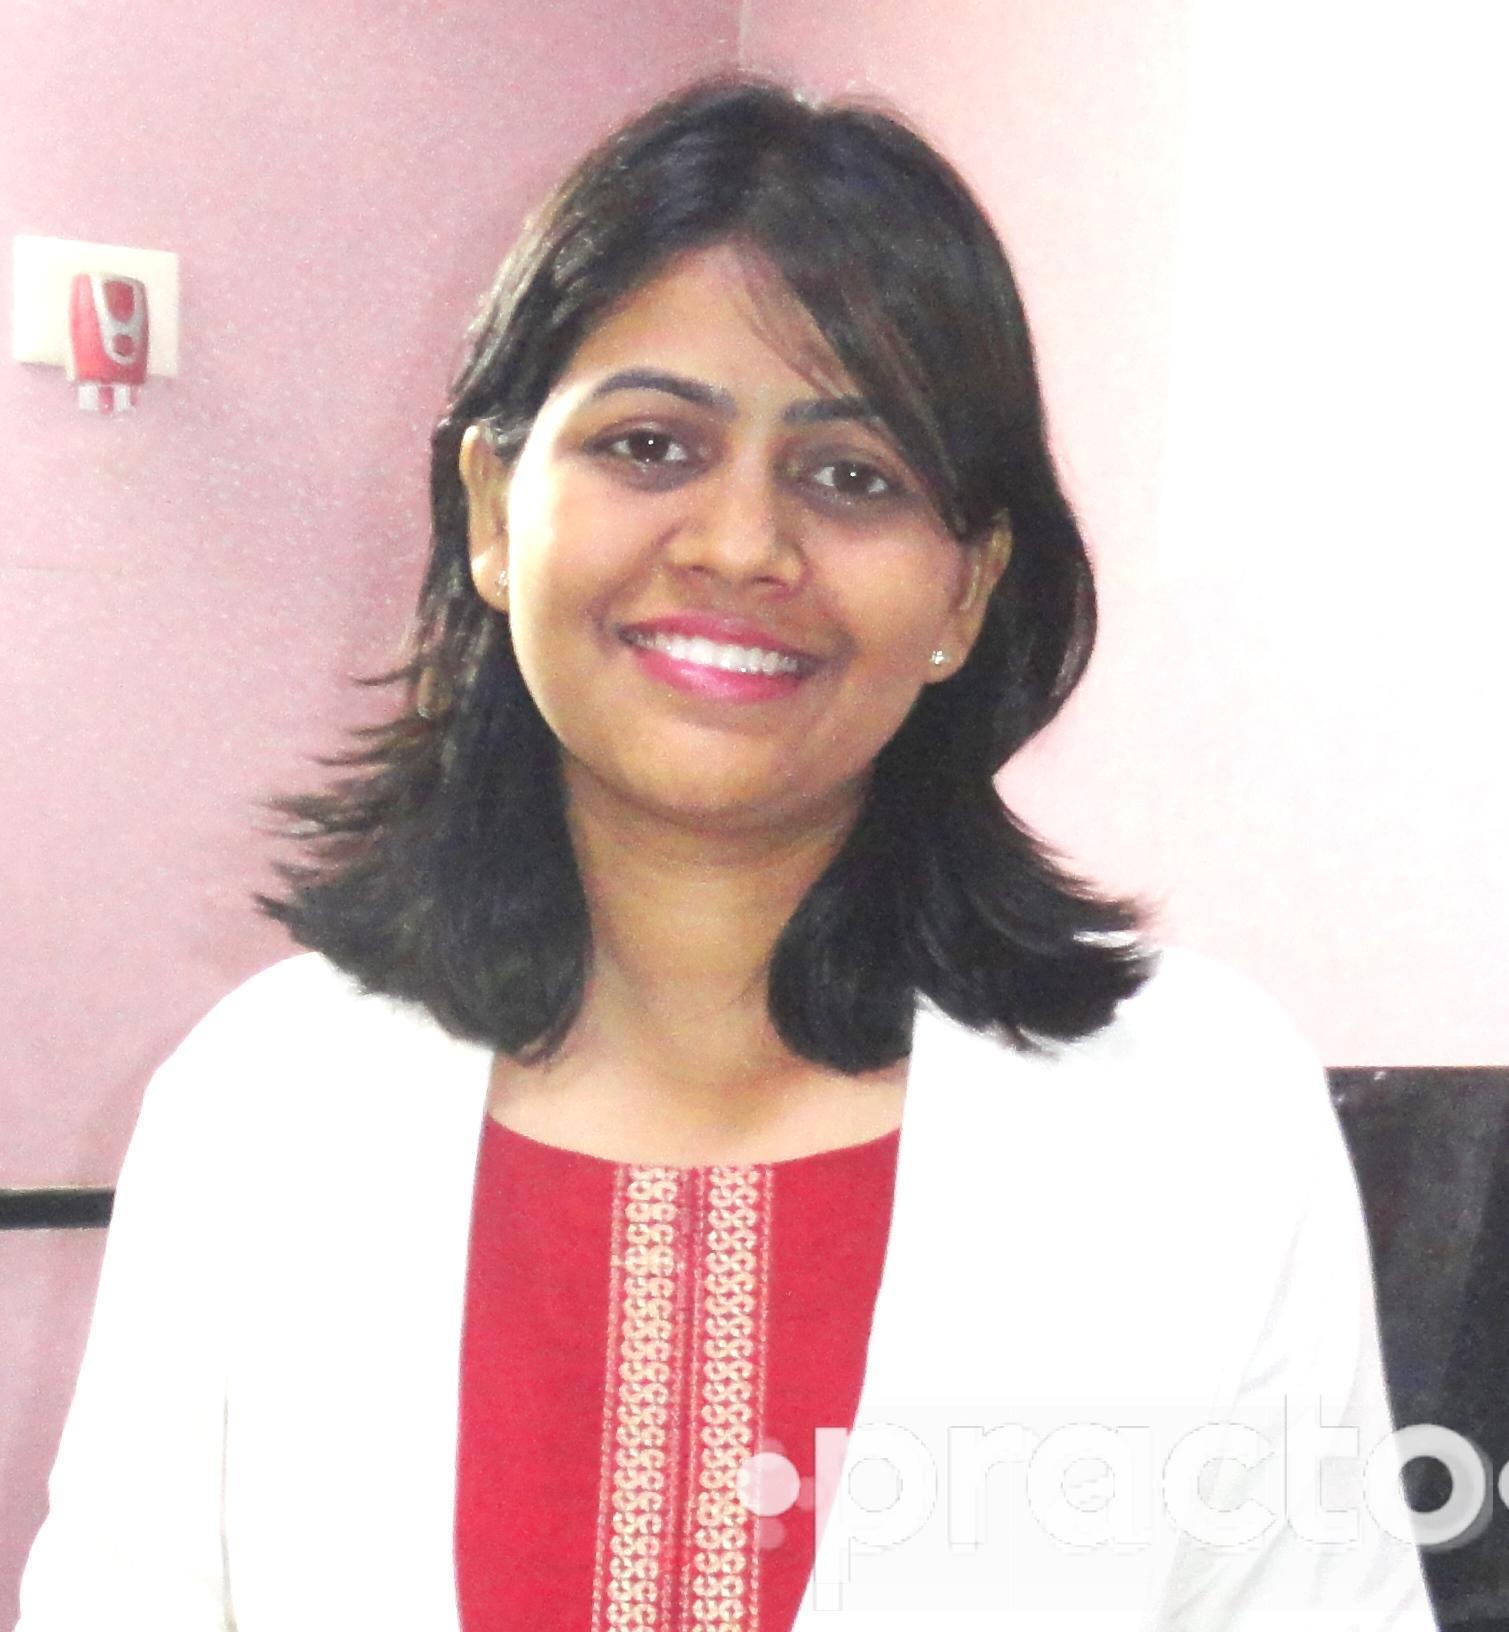 Dr. Anupama Yadav Iyer